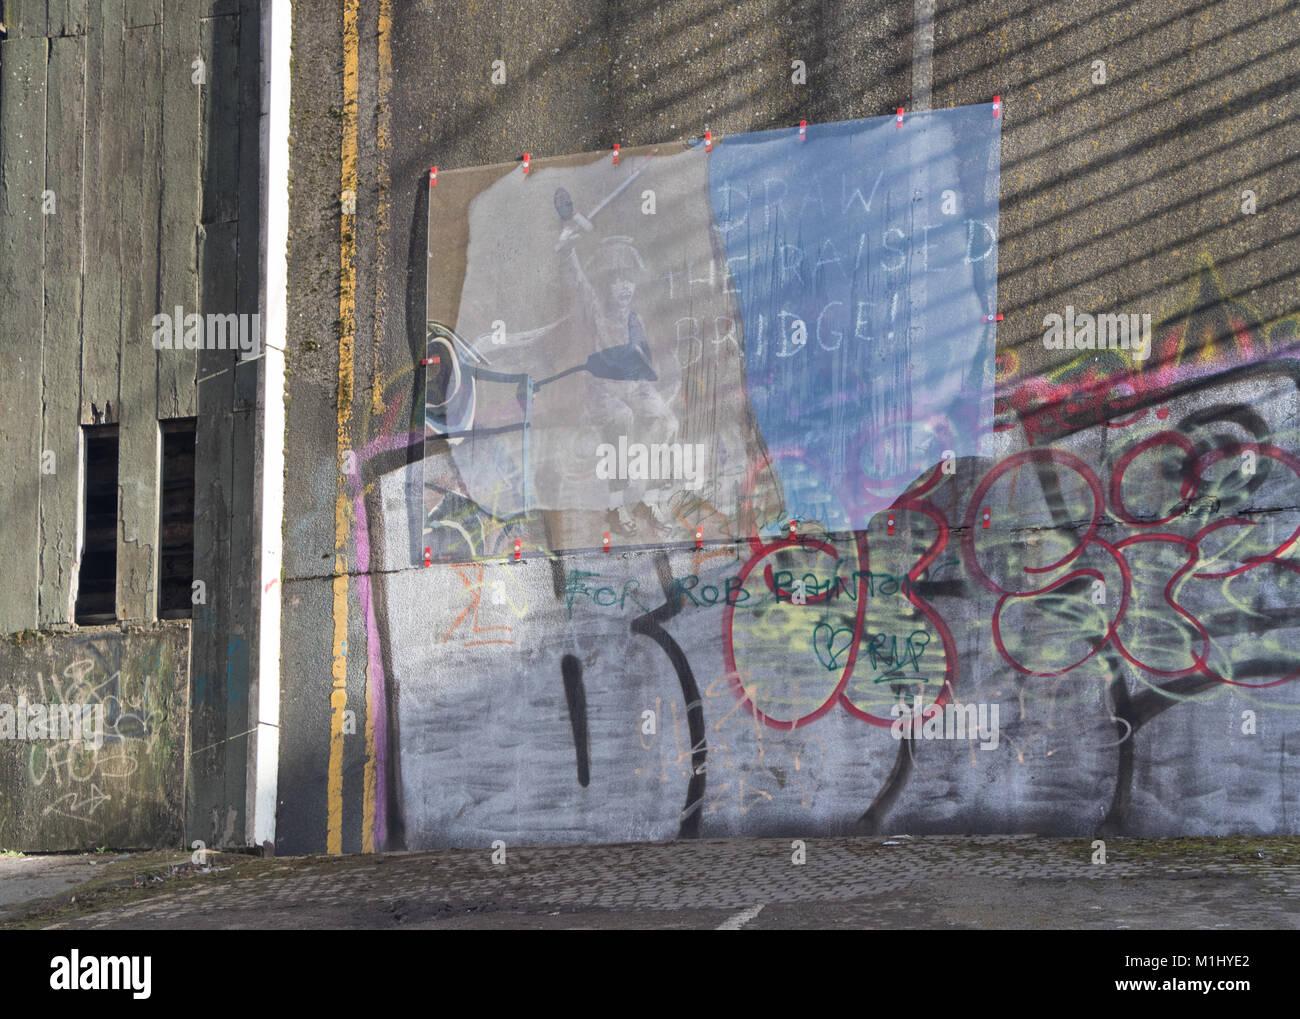 The Banksy art work in Hull - Stock Image